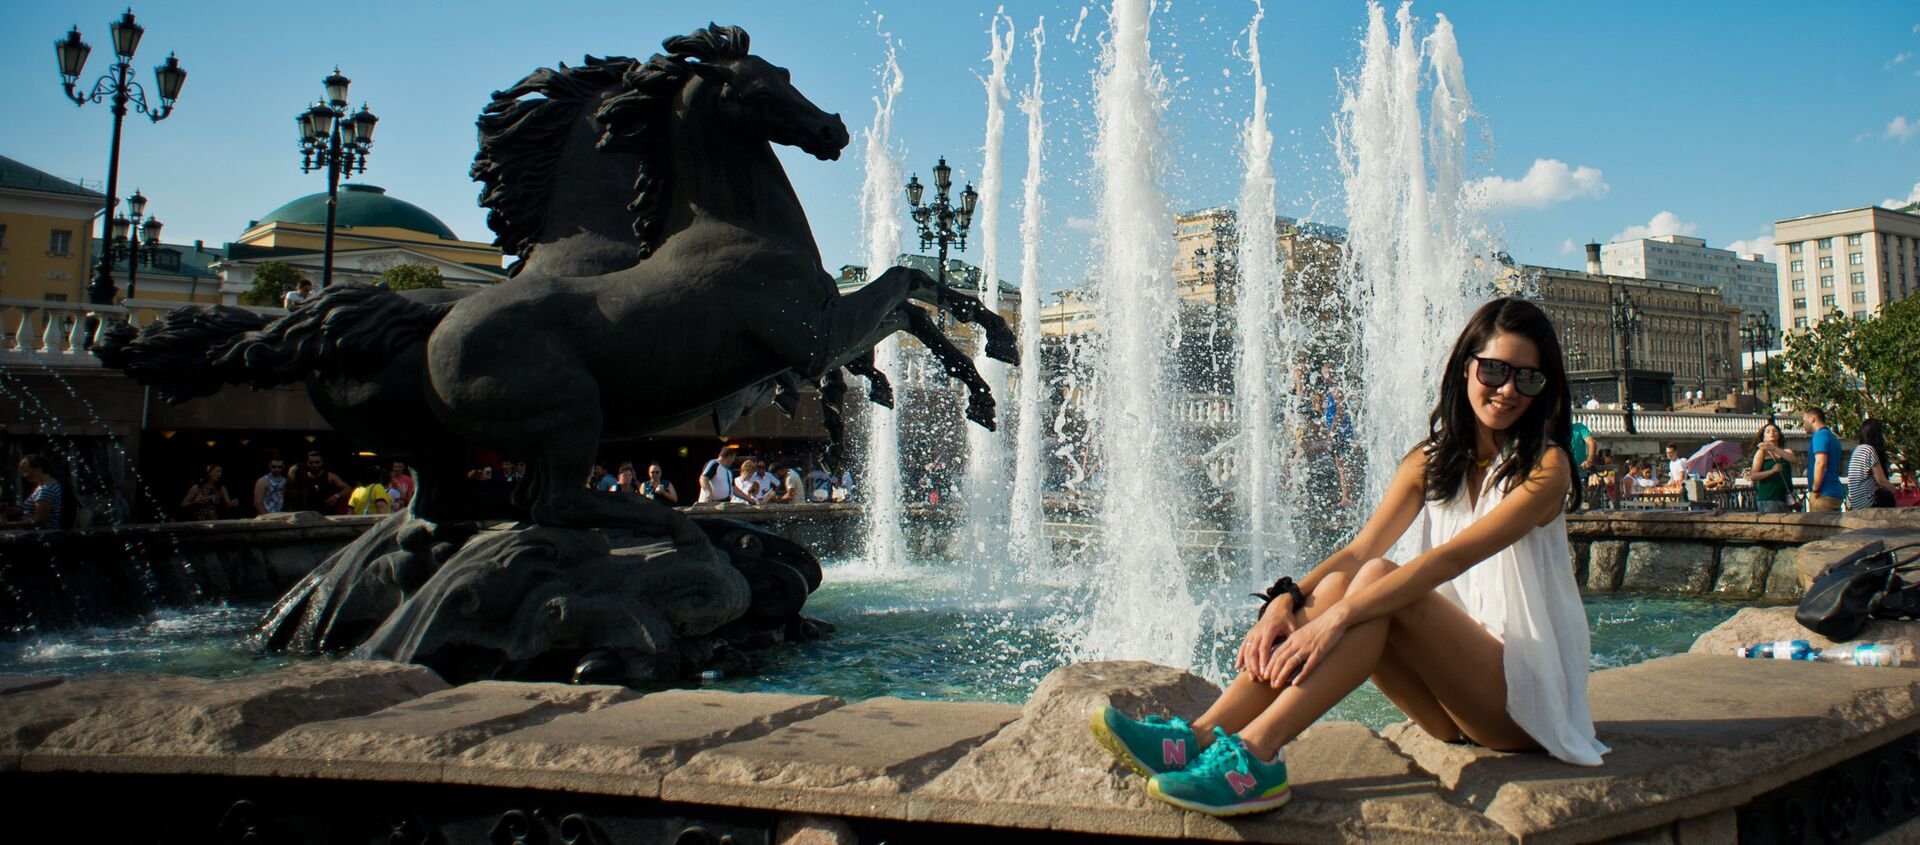 Tourists pose for photos at the Four Seasons fountain on Manezh Square - Sputnik Italia, 1920, 24.01.2021